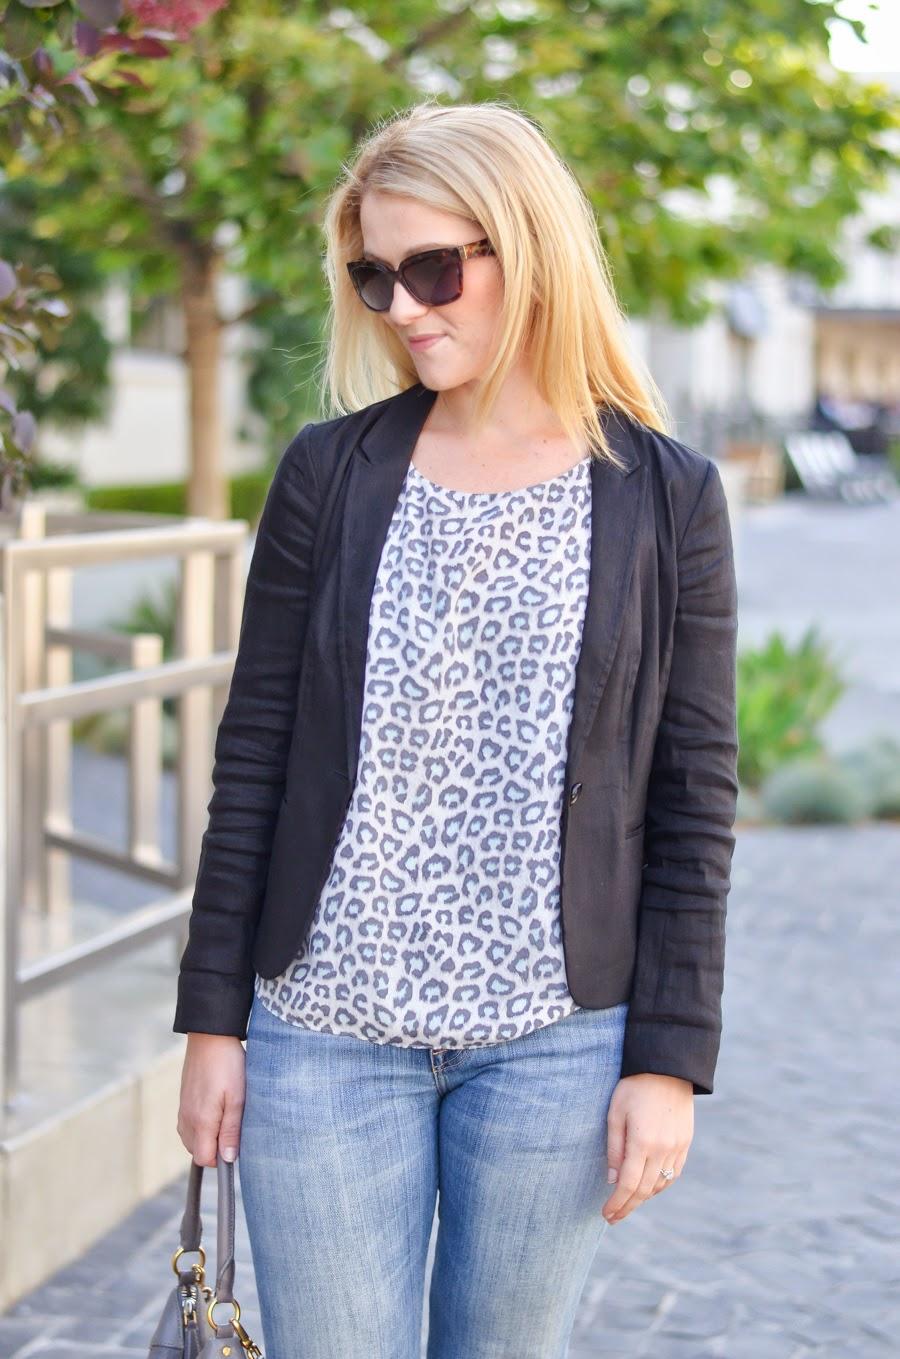 The Black Wedge   Current Elliott Boyfriend Jeans + Anyi Lu Black Wedge Sandals   Luci's Morsels :: LA Fashion Blogger